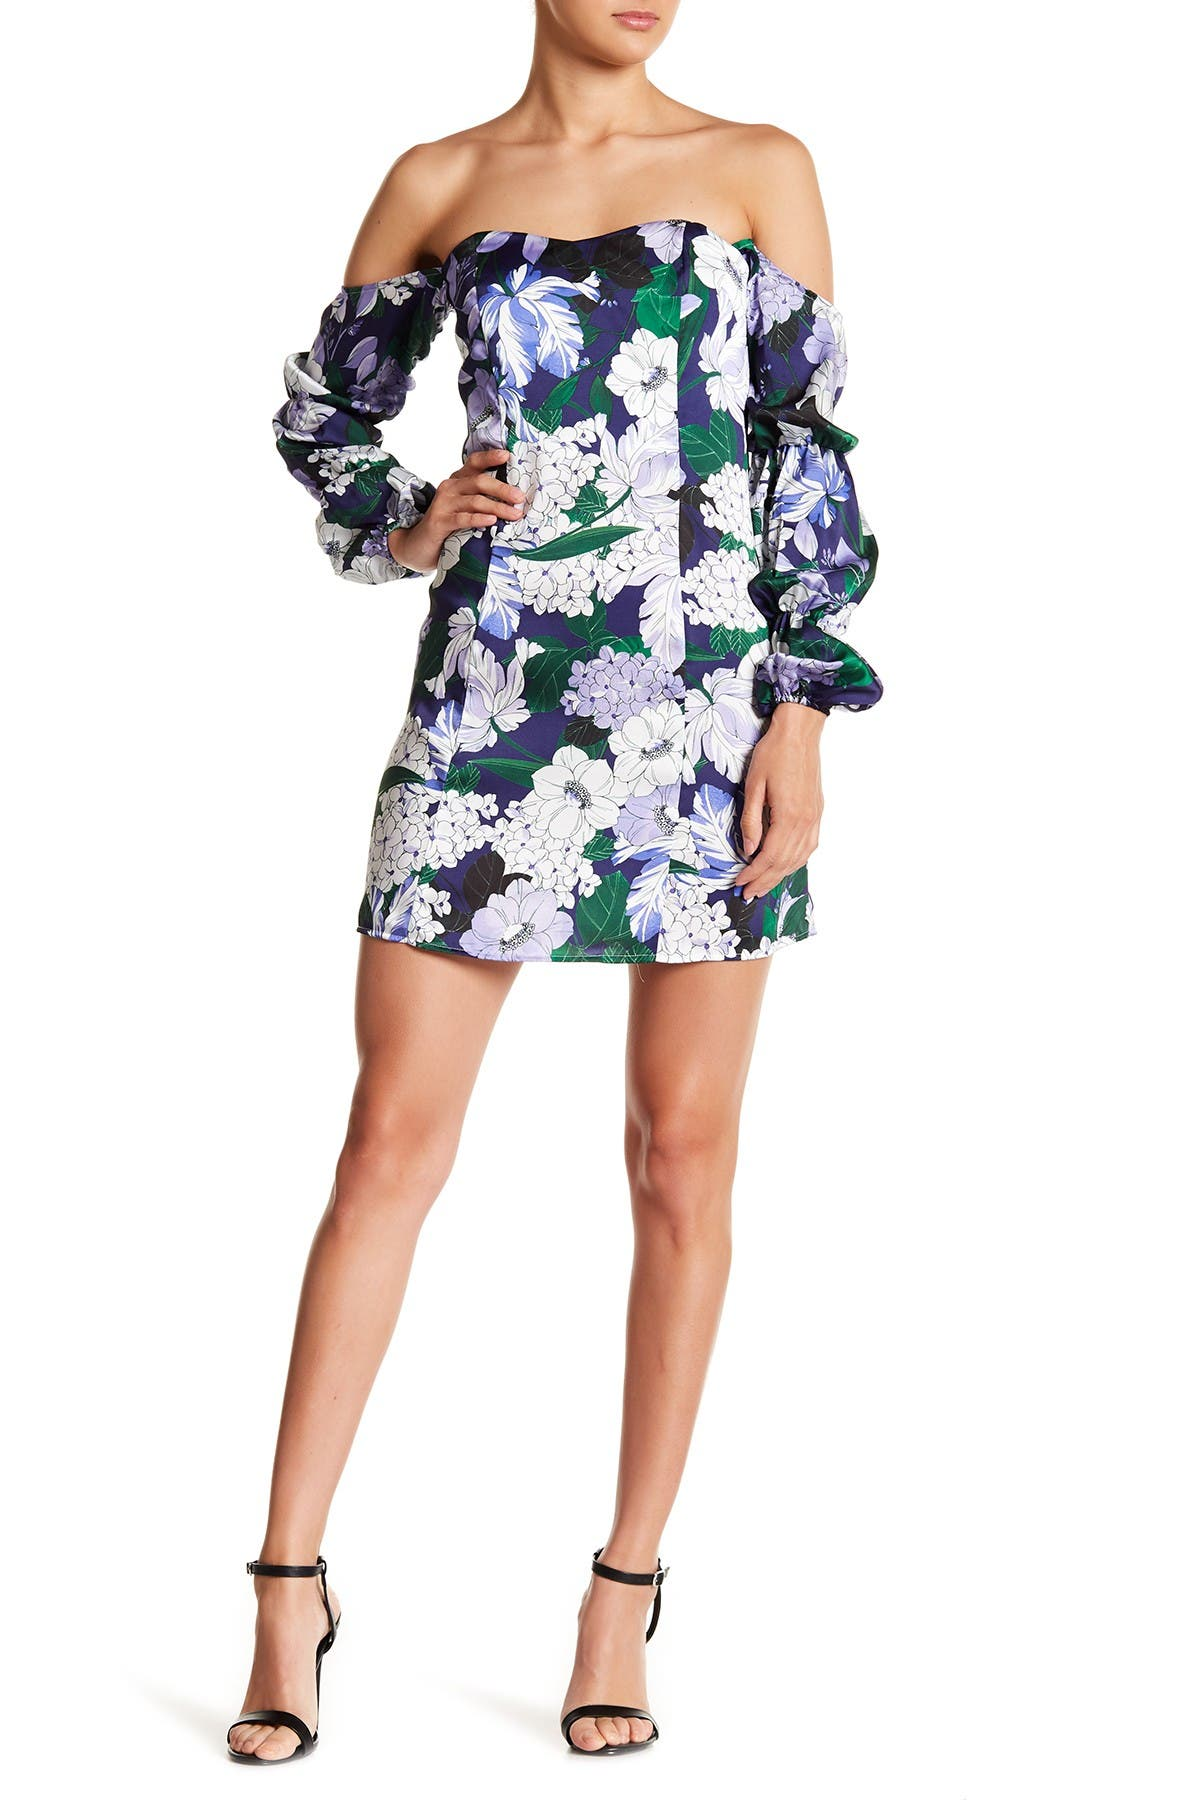 Image of Alexia Admor Floral Print Off-the-Shoulder Dress